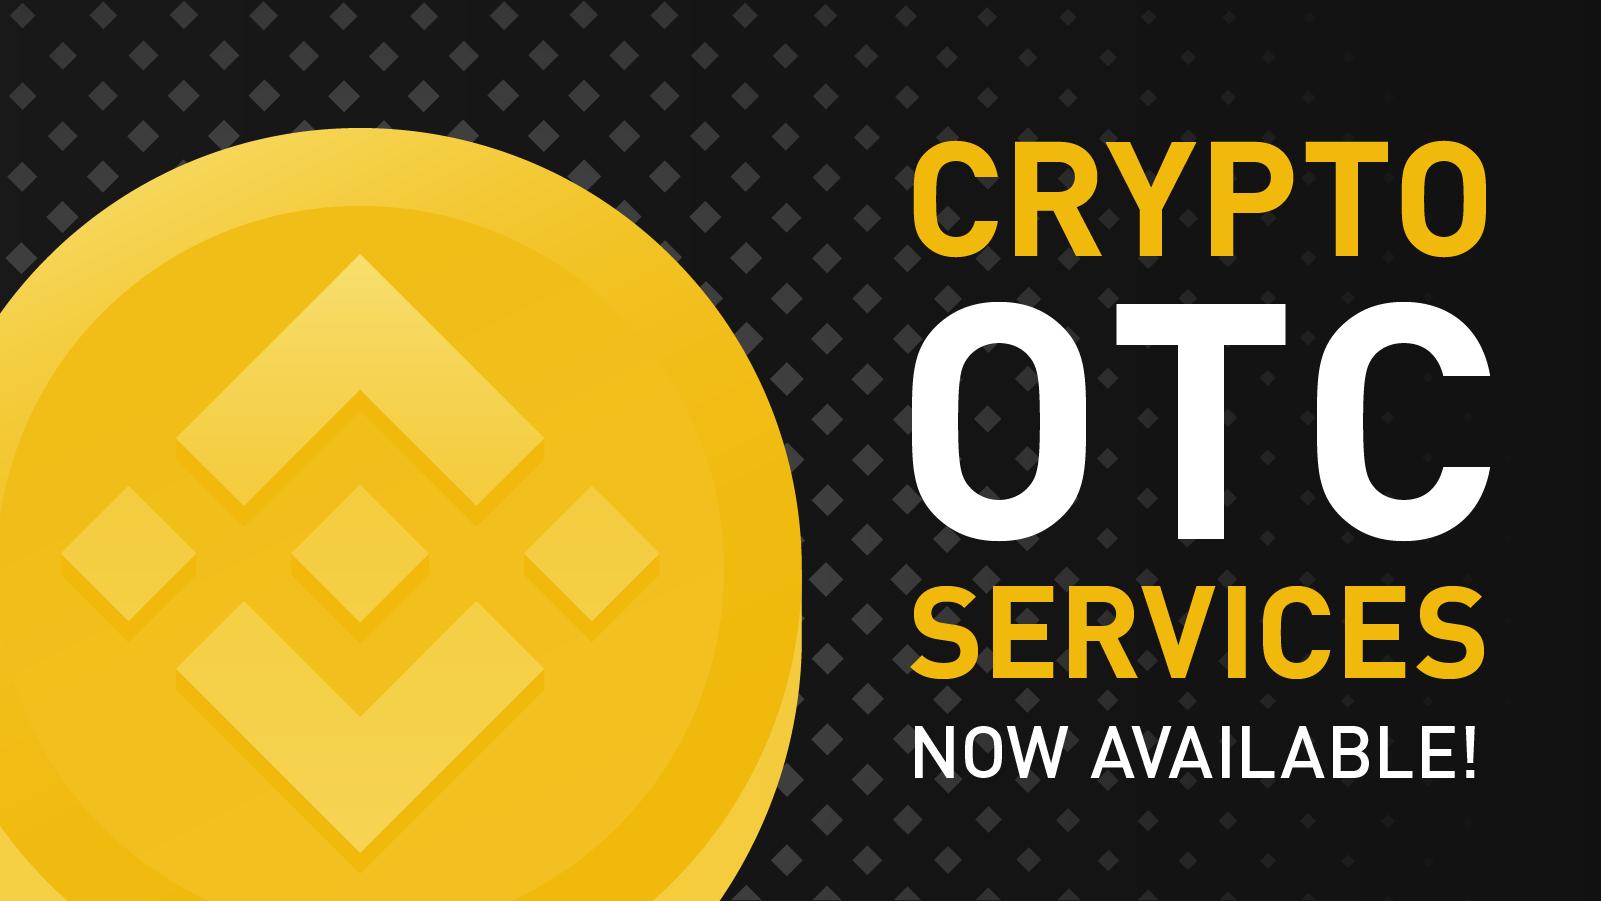 Crypto OTC Services Now Available on Binance | Binance Blog